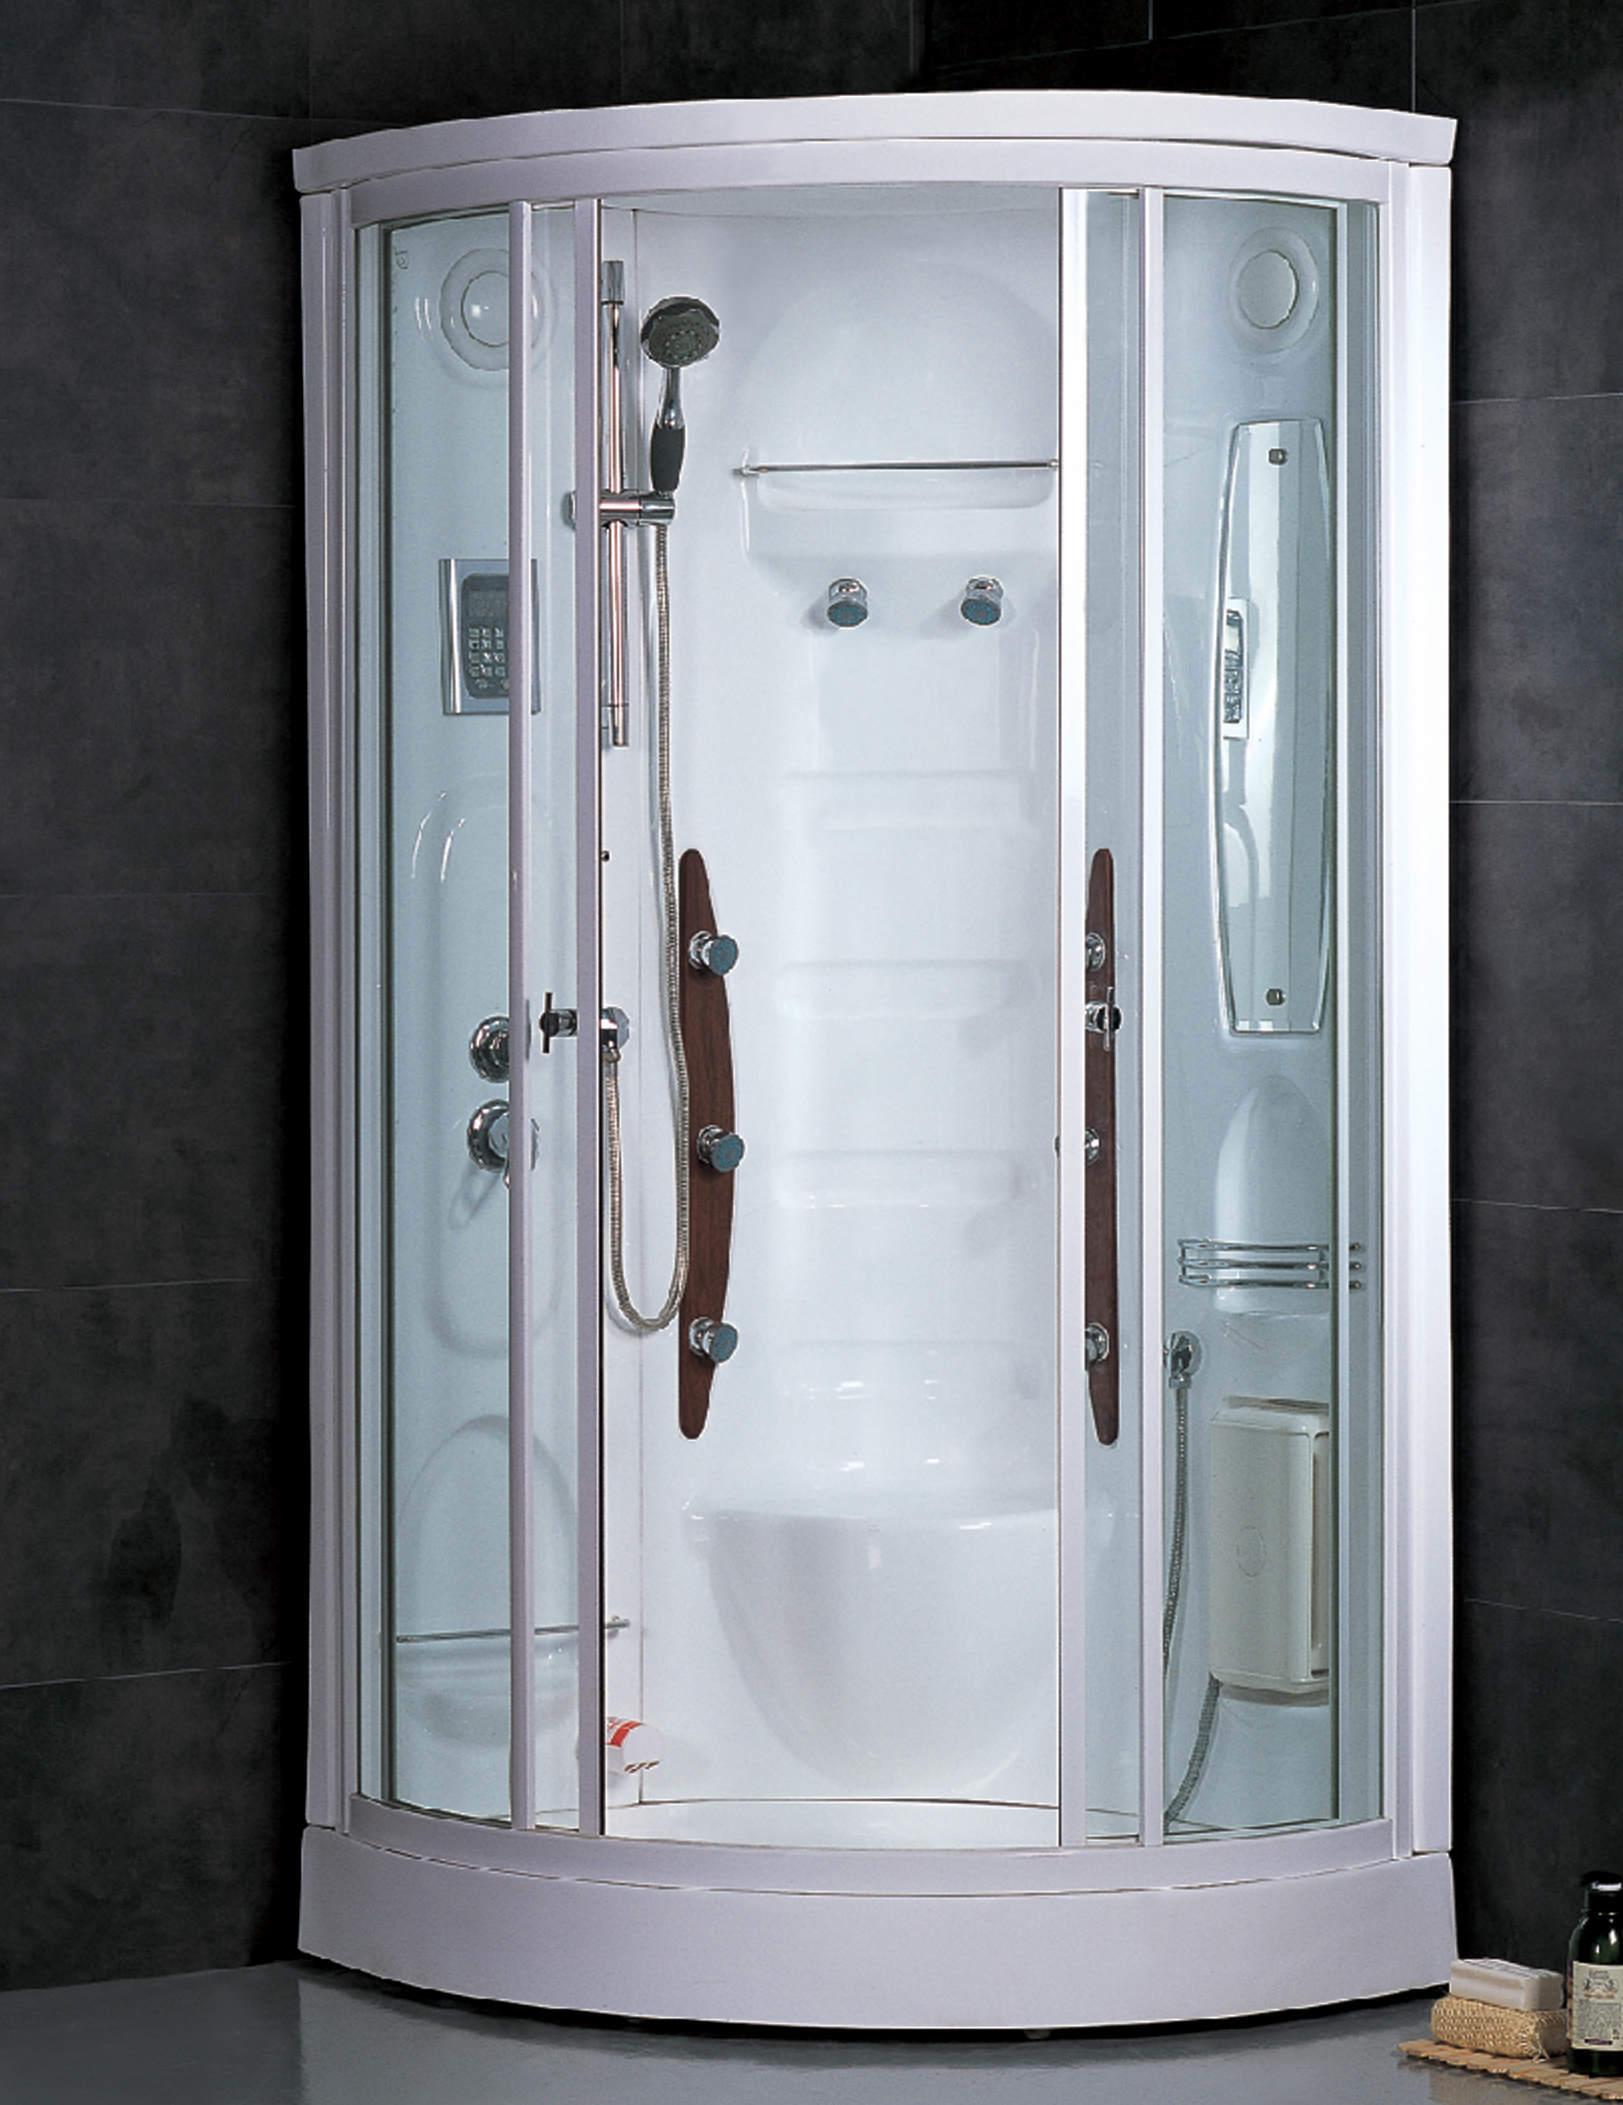 Doccia mezza della vasca da bagno (G258) – Doccia mezza della vasca da bagno (G258)fornito ...